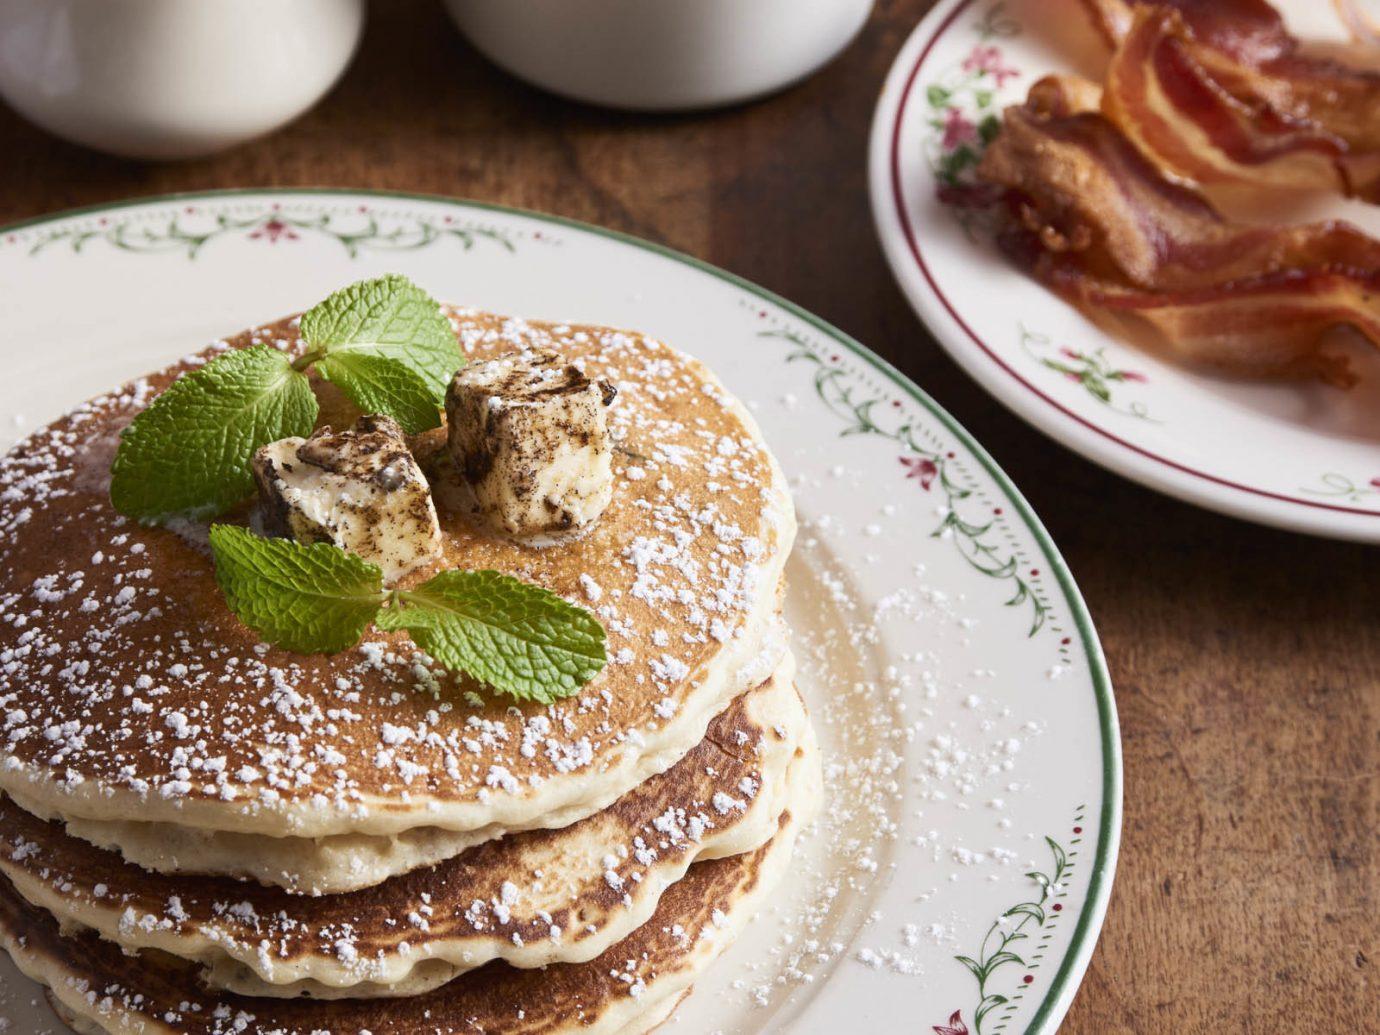 Food + Drink cup plate table coffee dish food meal breakfast pancake produce dessert cuisine flavor